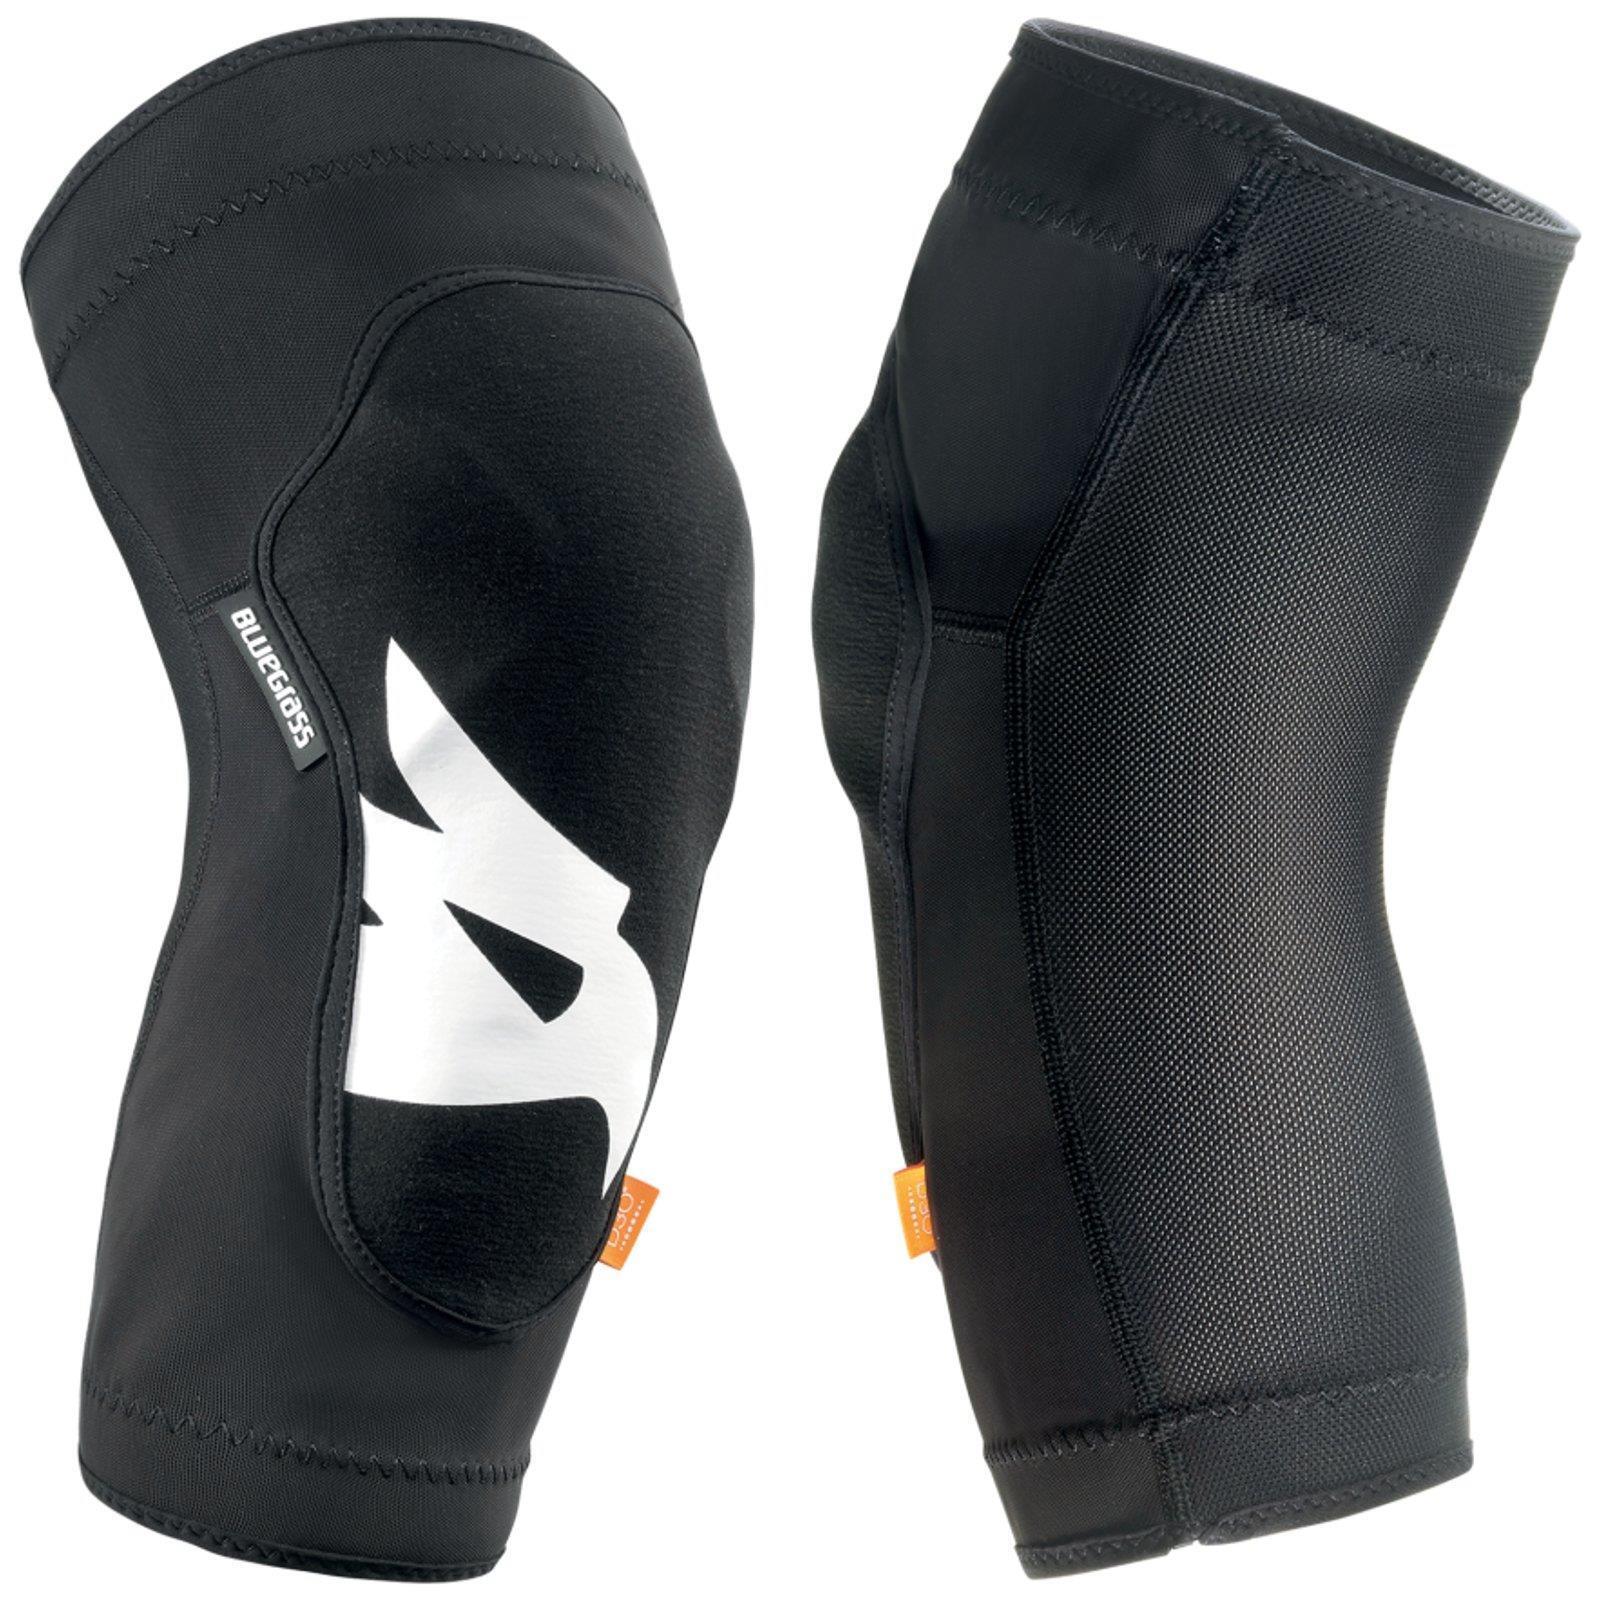 azulgrass Skinny d3o knee cincha patelar projoectores projoección rodilla downhill MTB FR DH